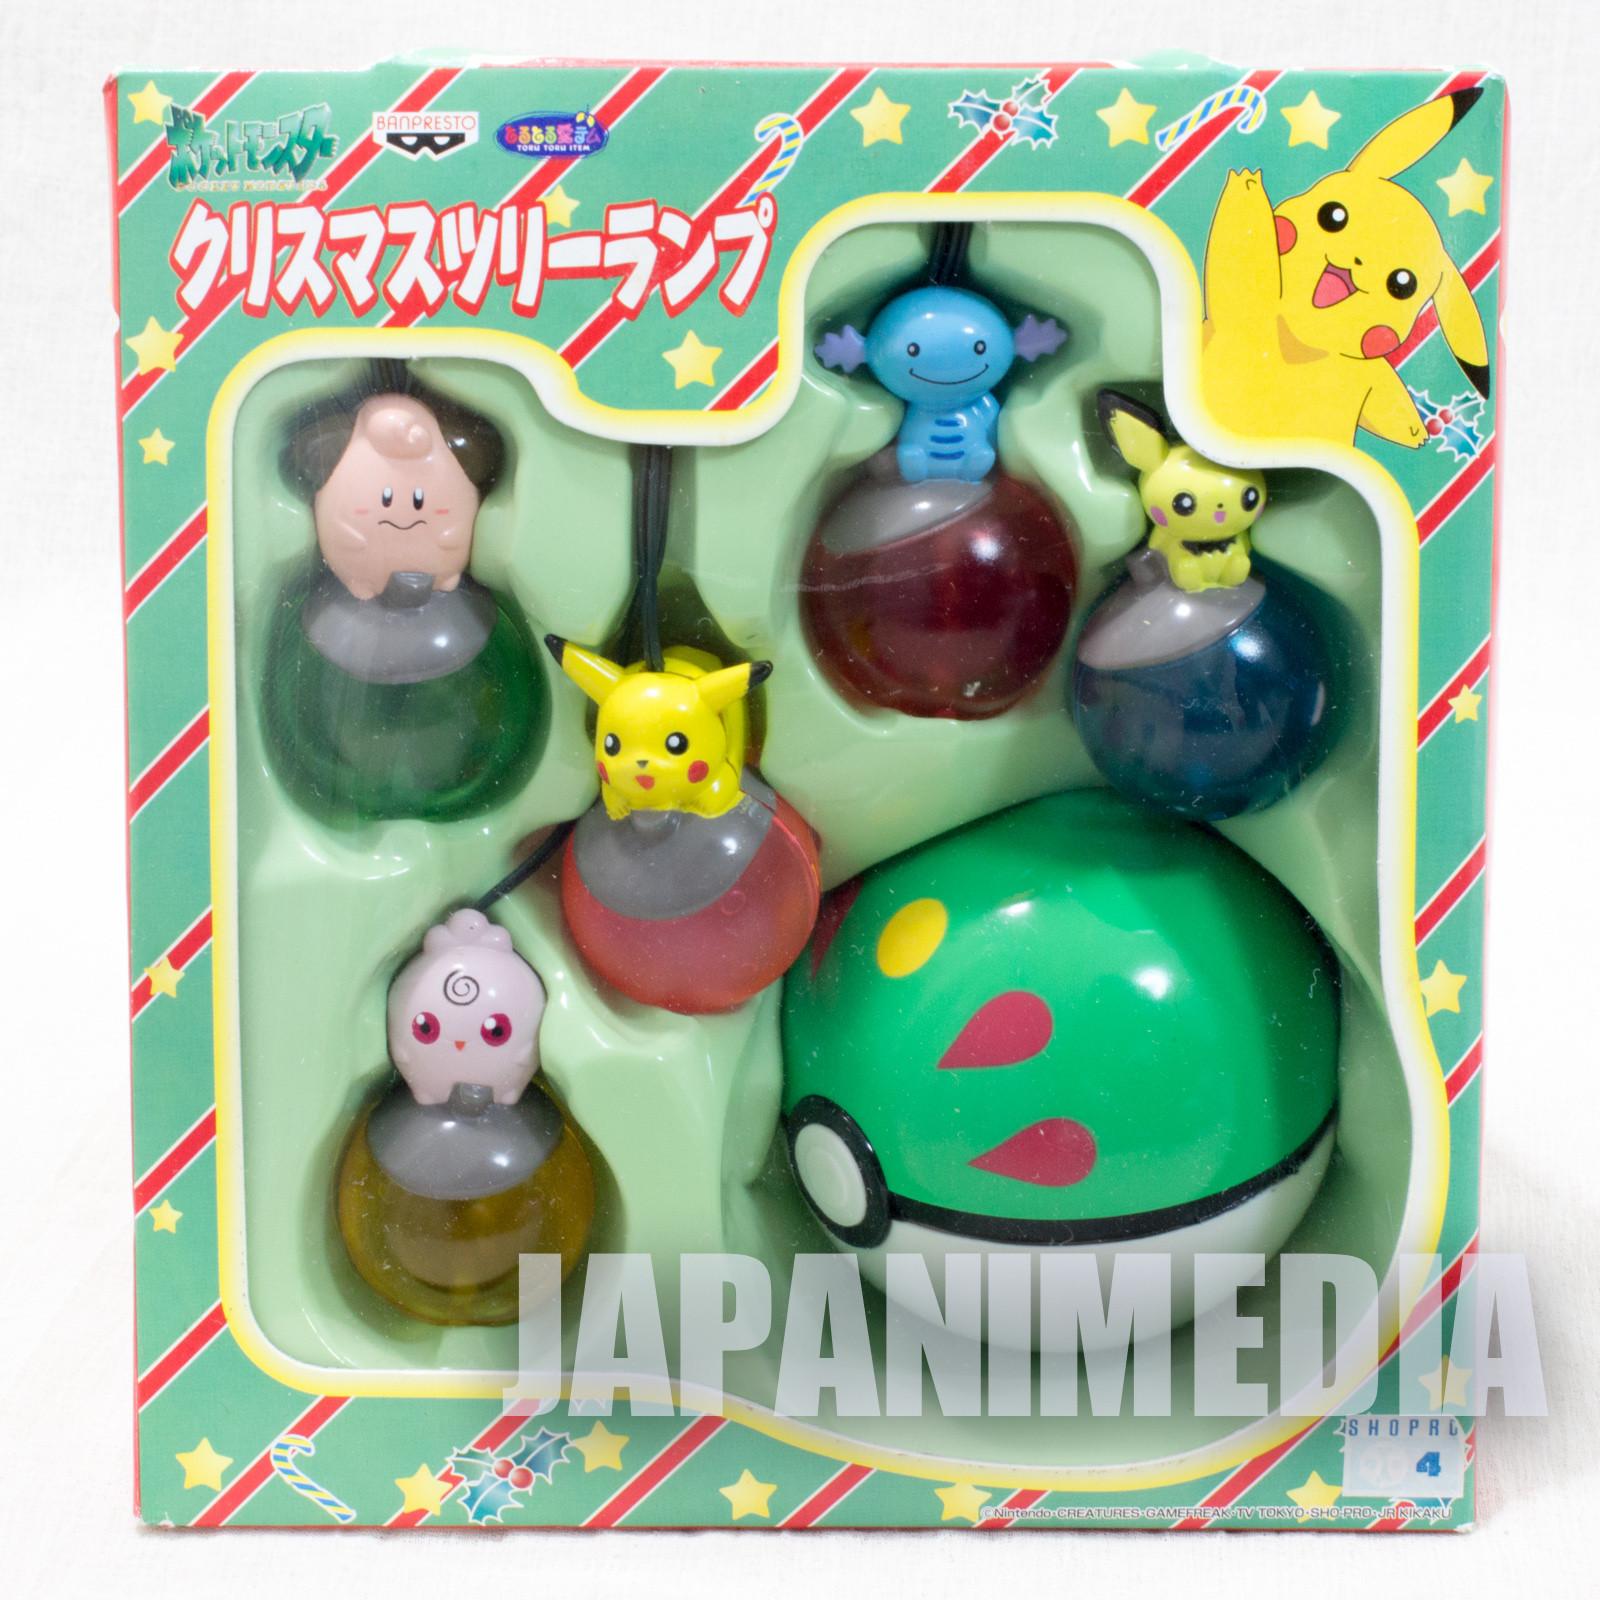 Pokemon Christmas Tree Lamp Light Ornament #2 Banpresto JAPAN ANIME PIKACHU